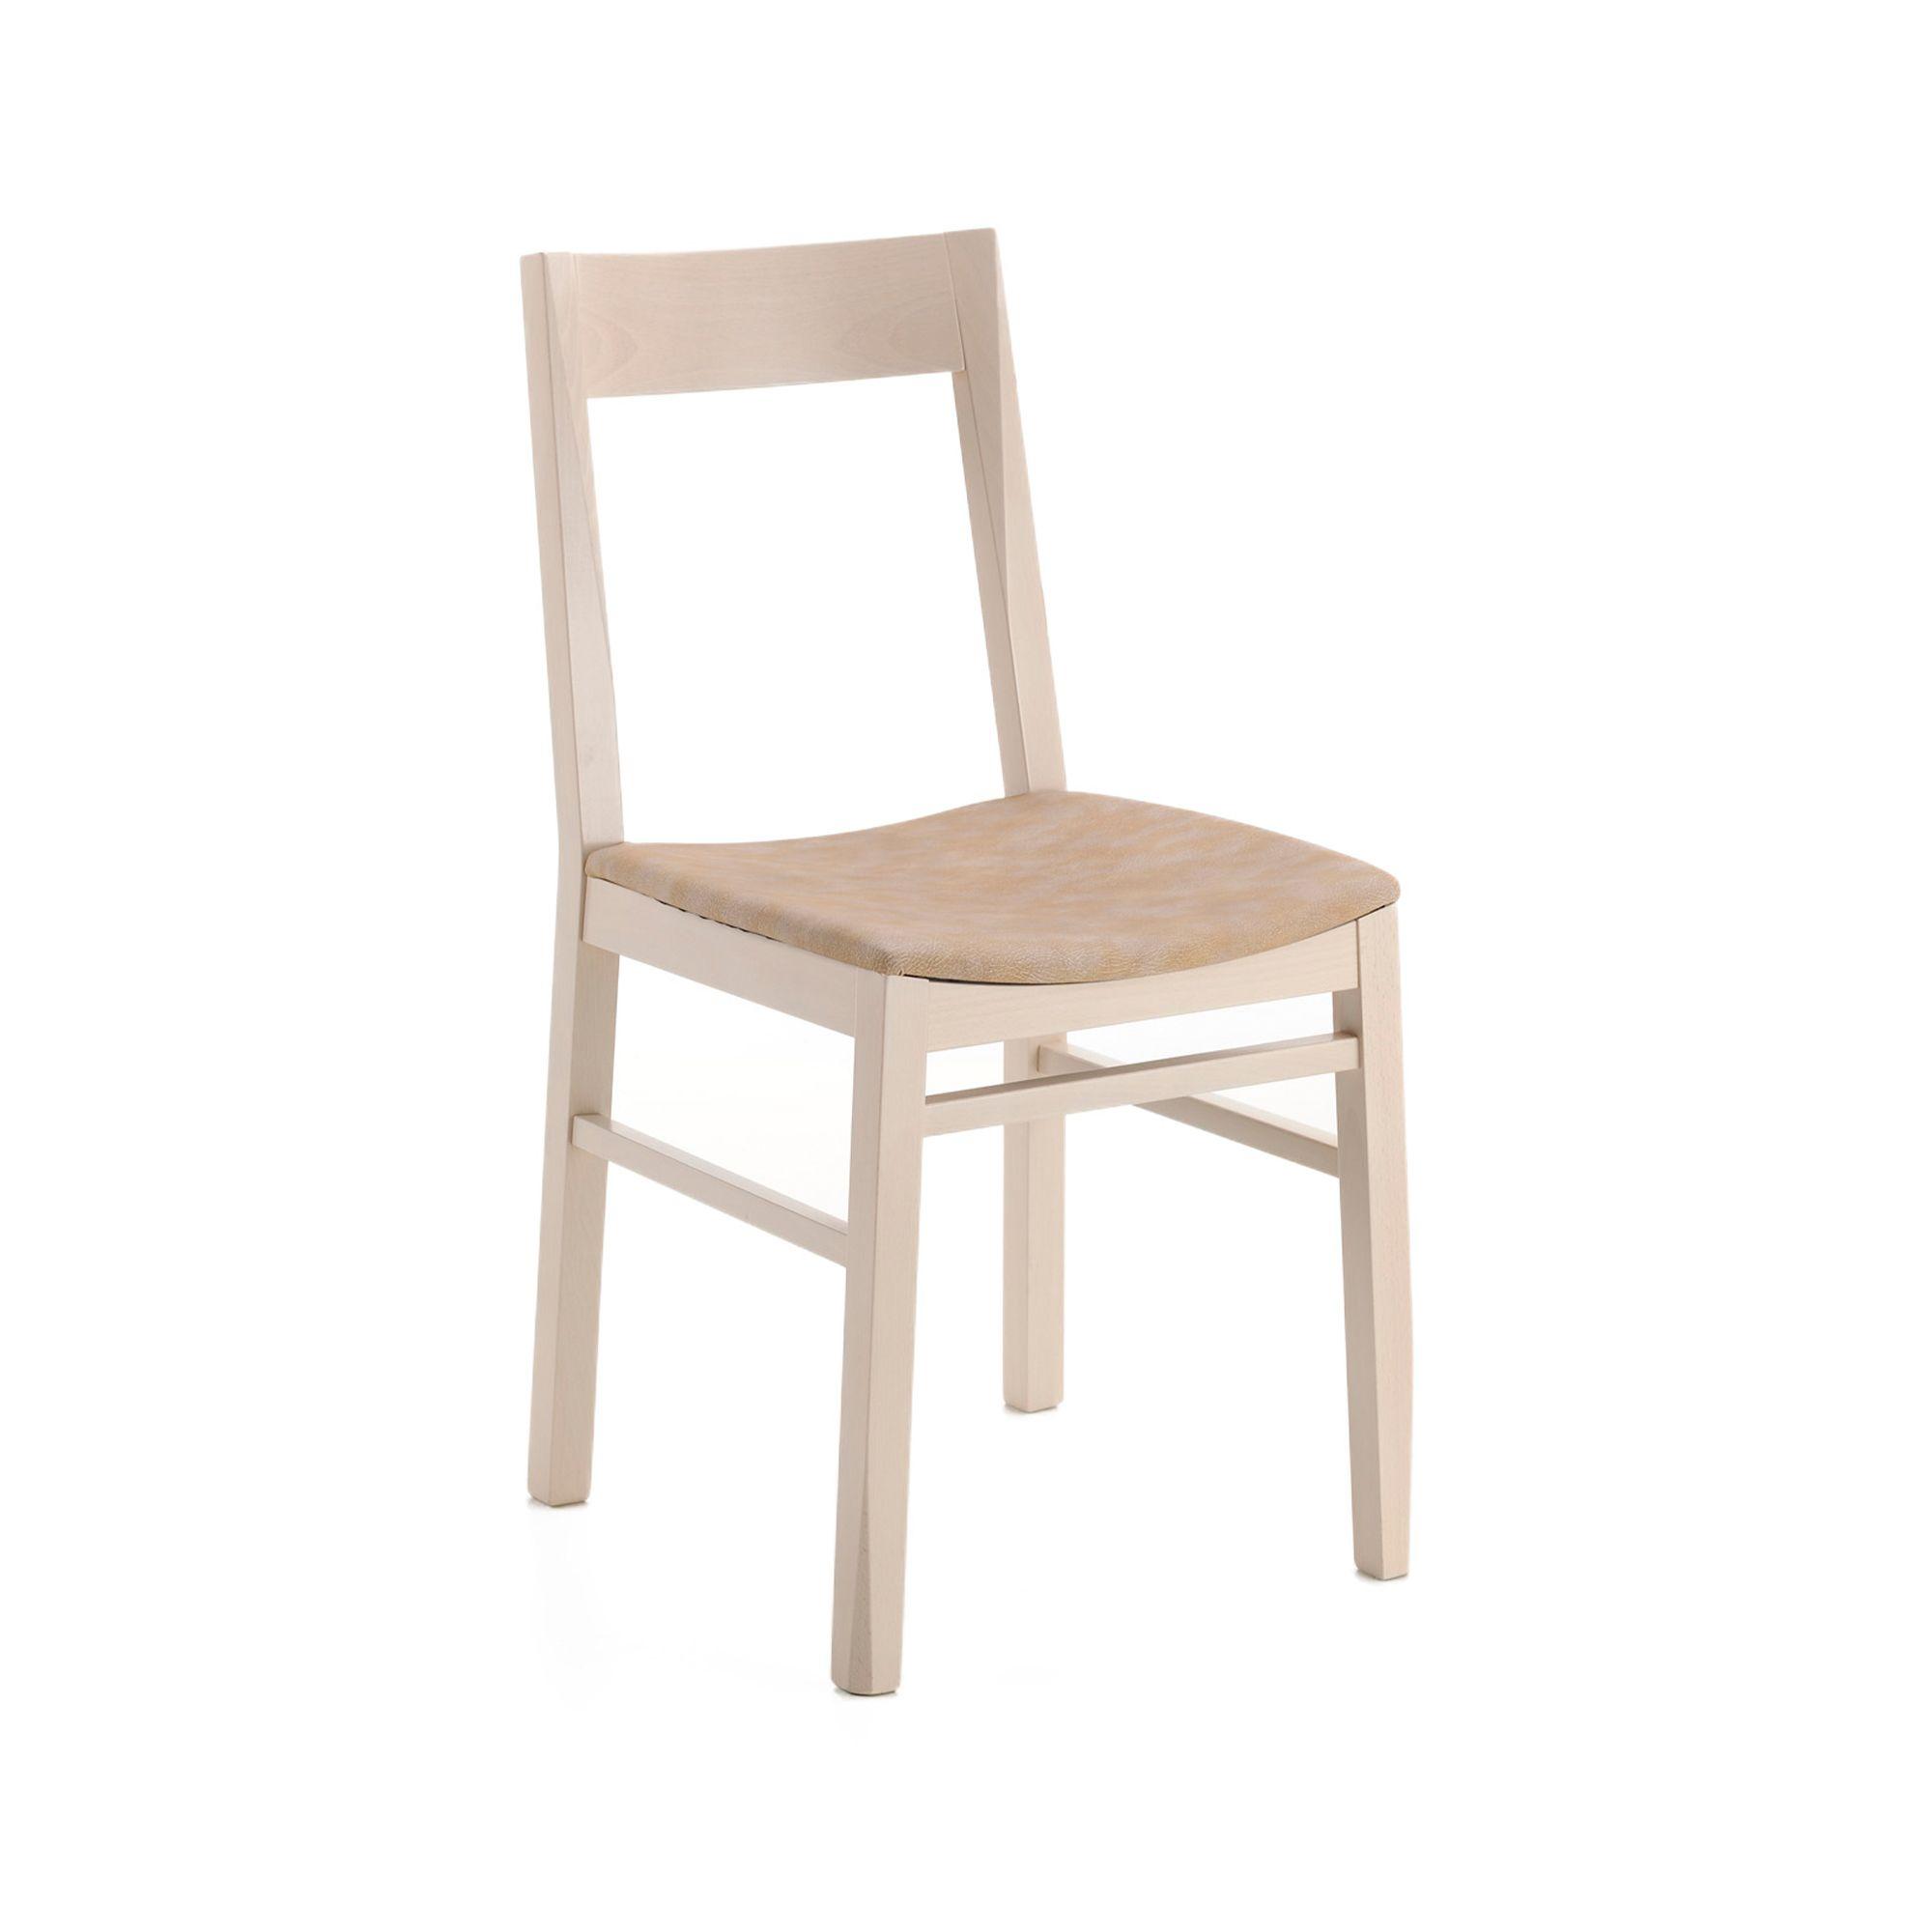 Sedia in stile moderno modello 874